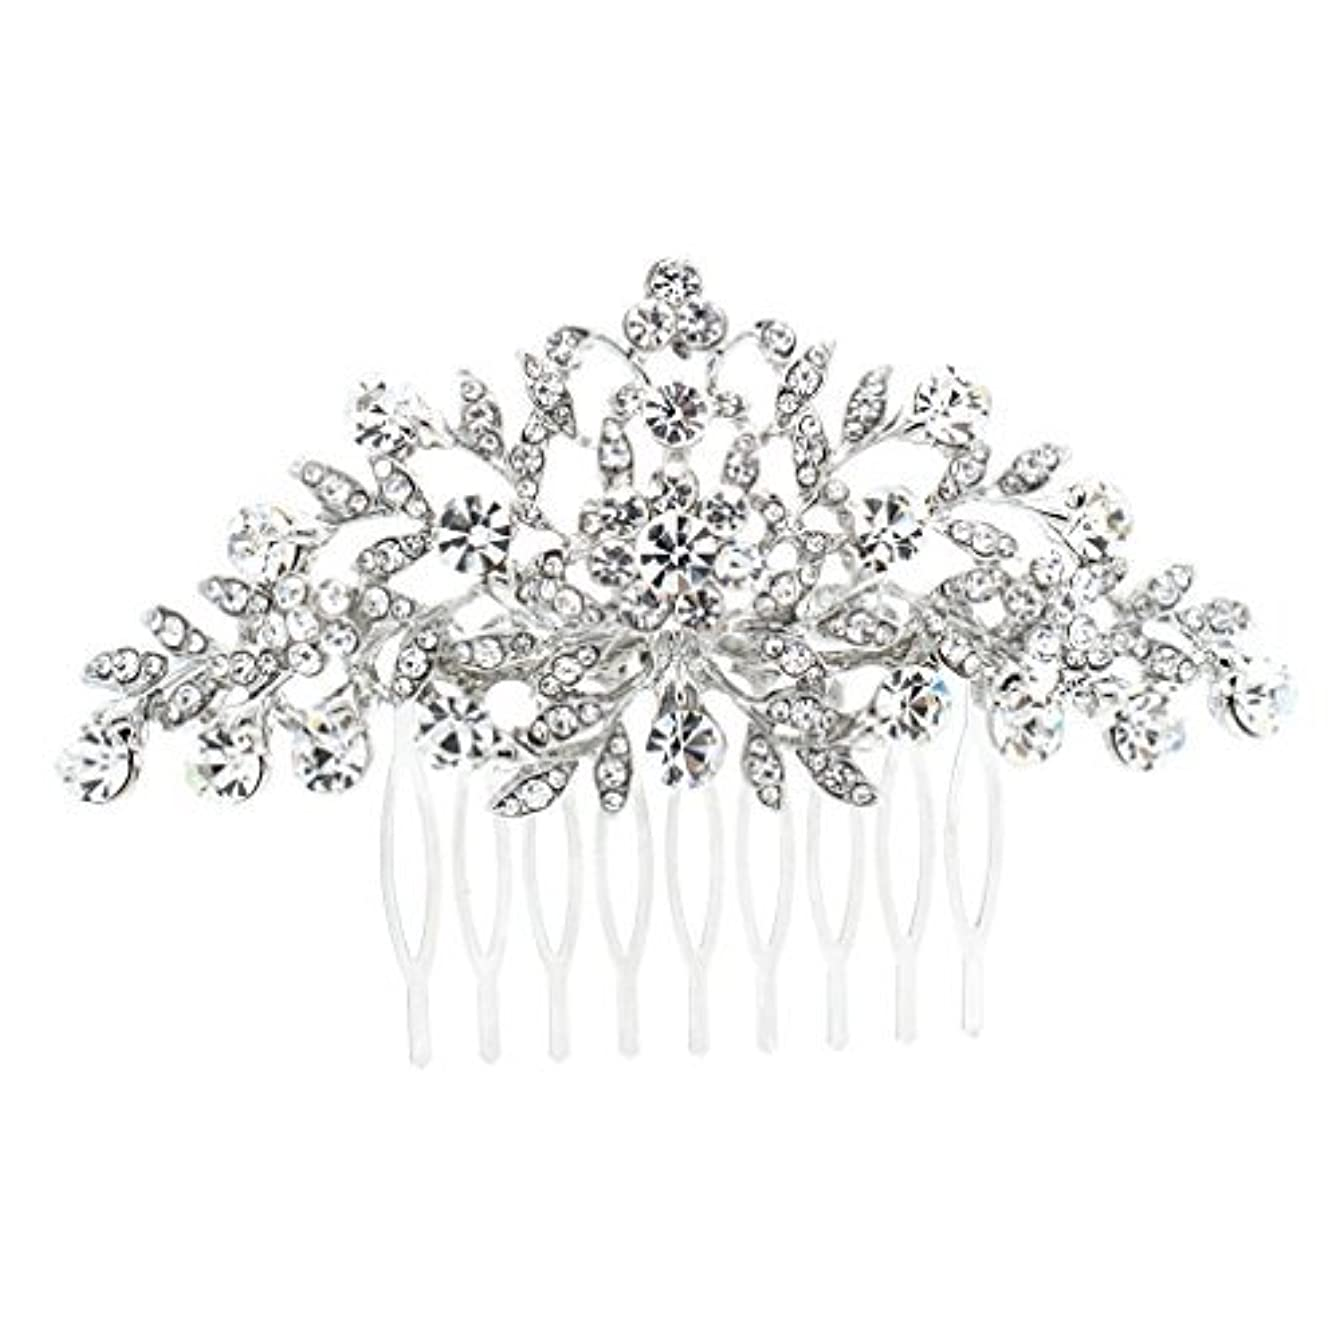 告発不調和勃起SEPBRDIALS Rhinestone Crystal Hair Comb Pins Women Wedding Hair Jewelry Accessories FA2944 (Silver) [並行輸入品]